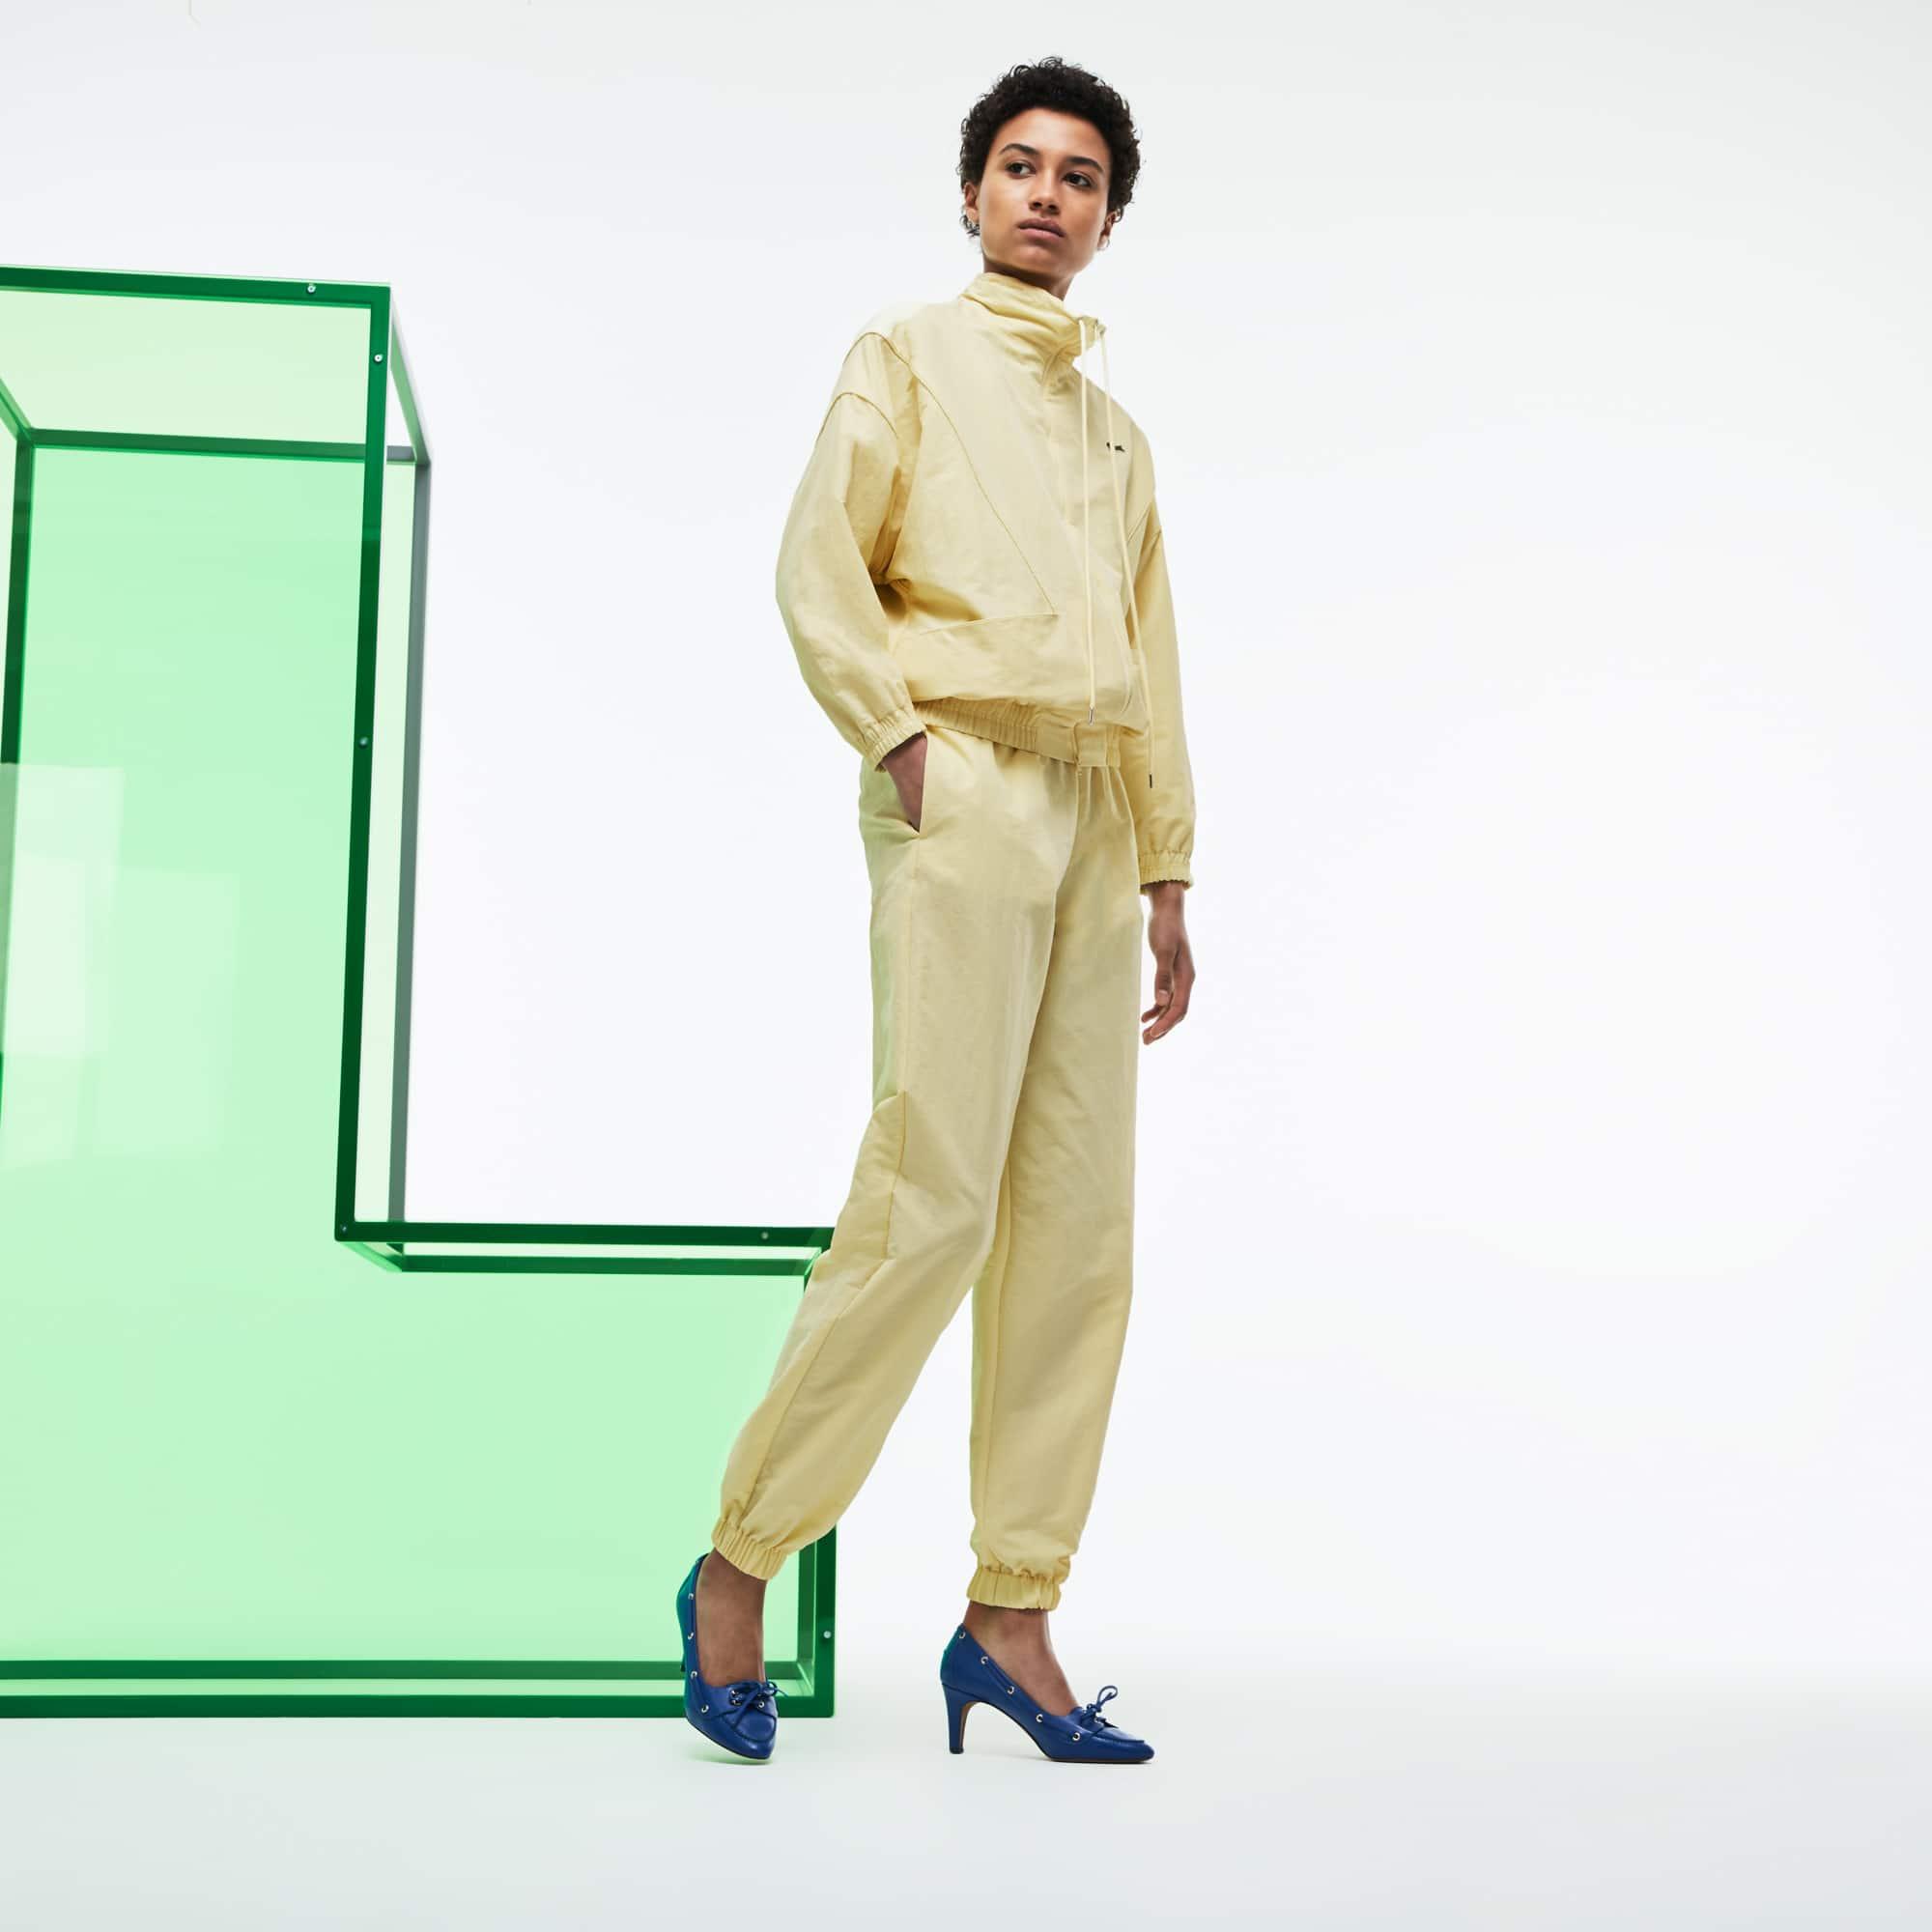 Pantaloni tuta loose fit in tela tecnica Edizione Défilé